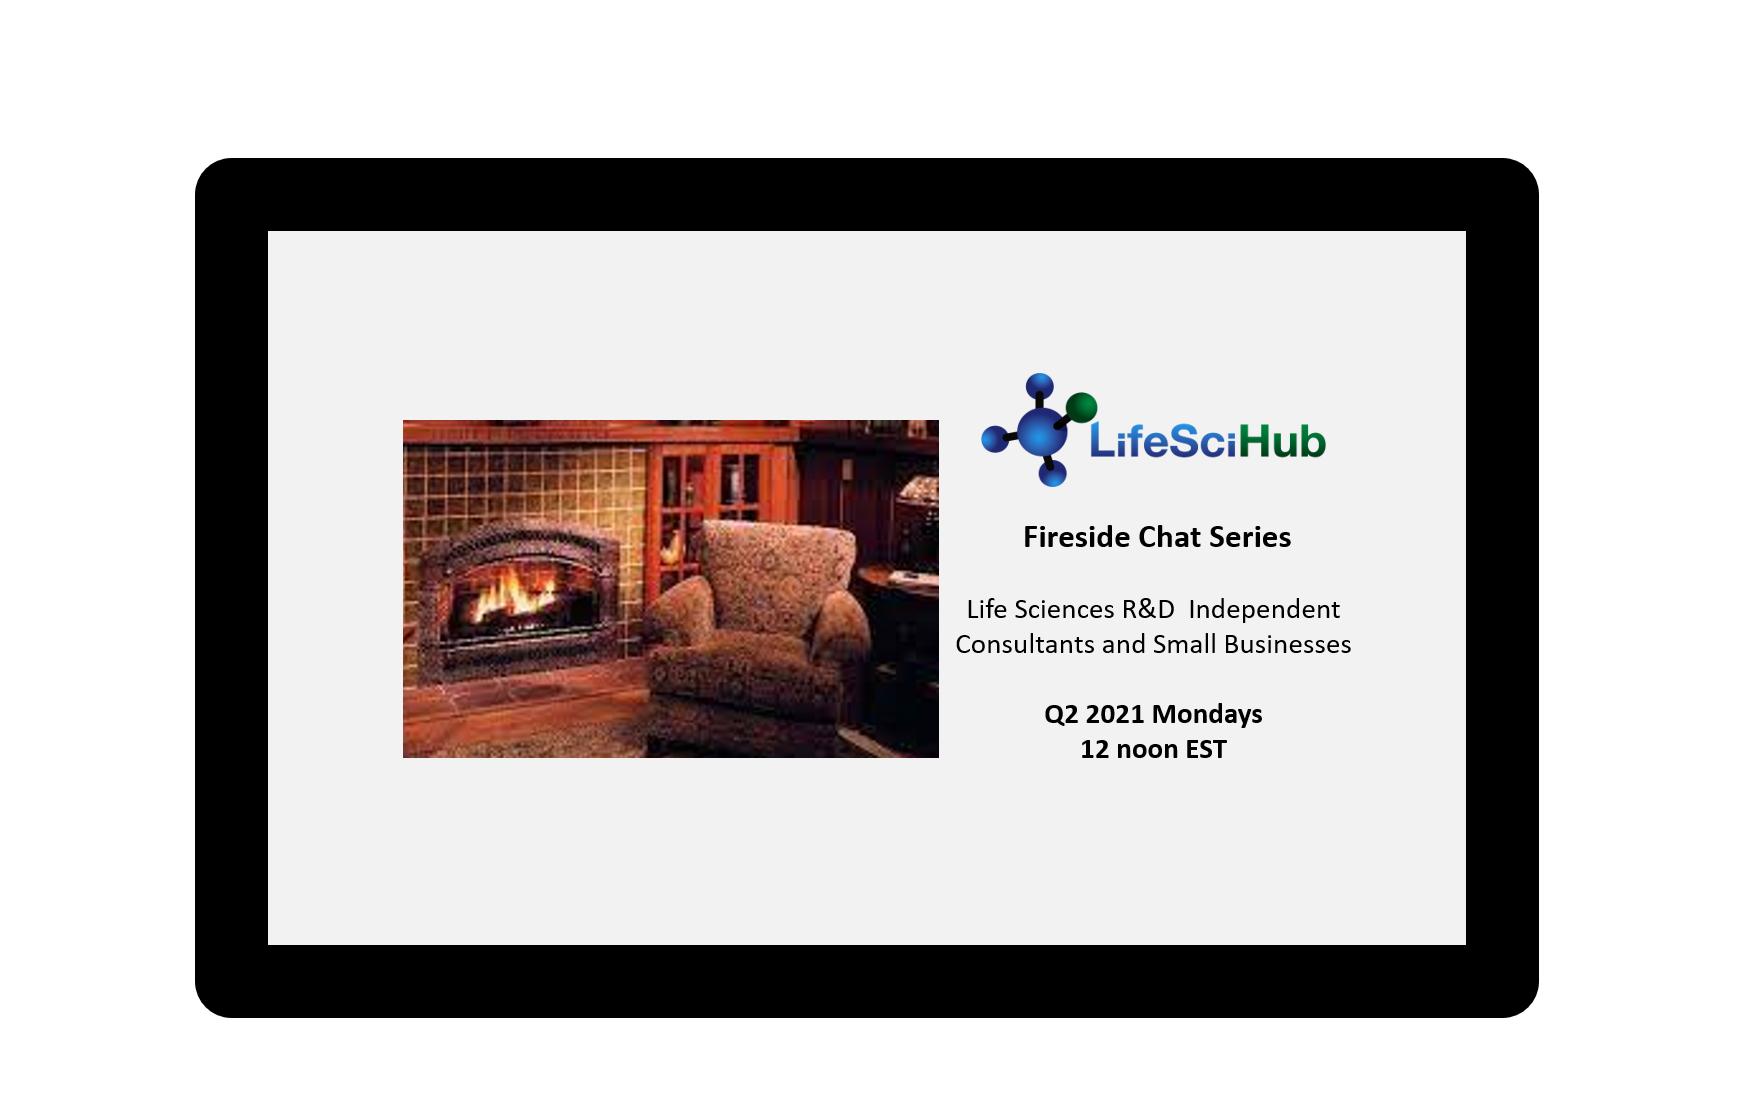 LifeSciHub Q2 2021 Fireside Chat Series